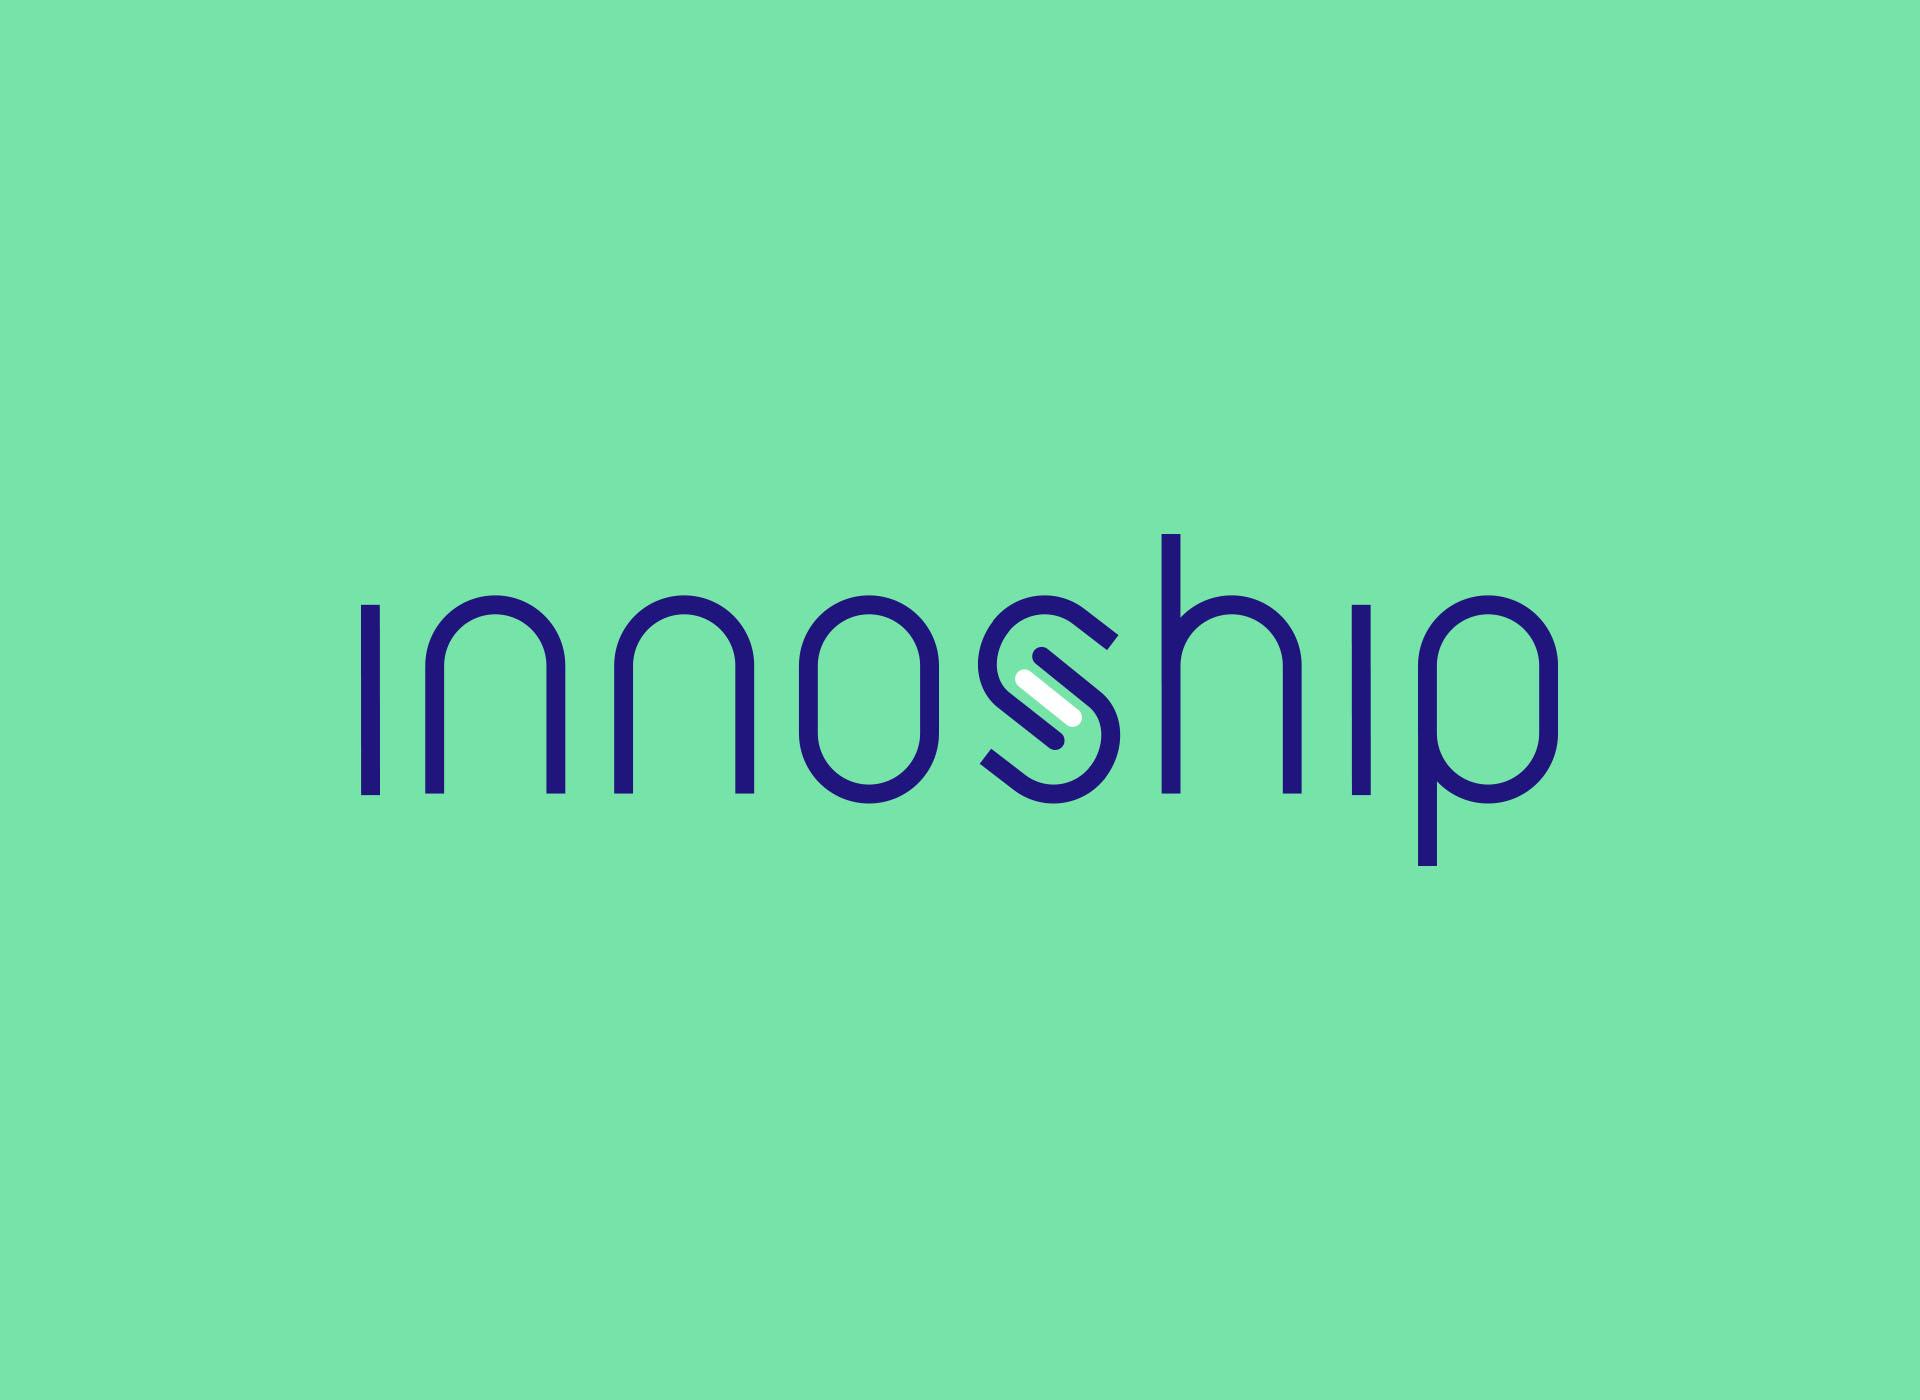 Innoship